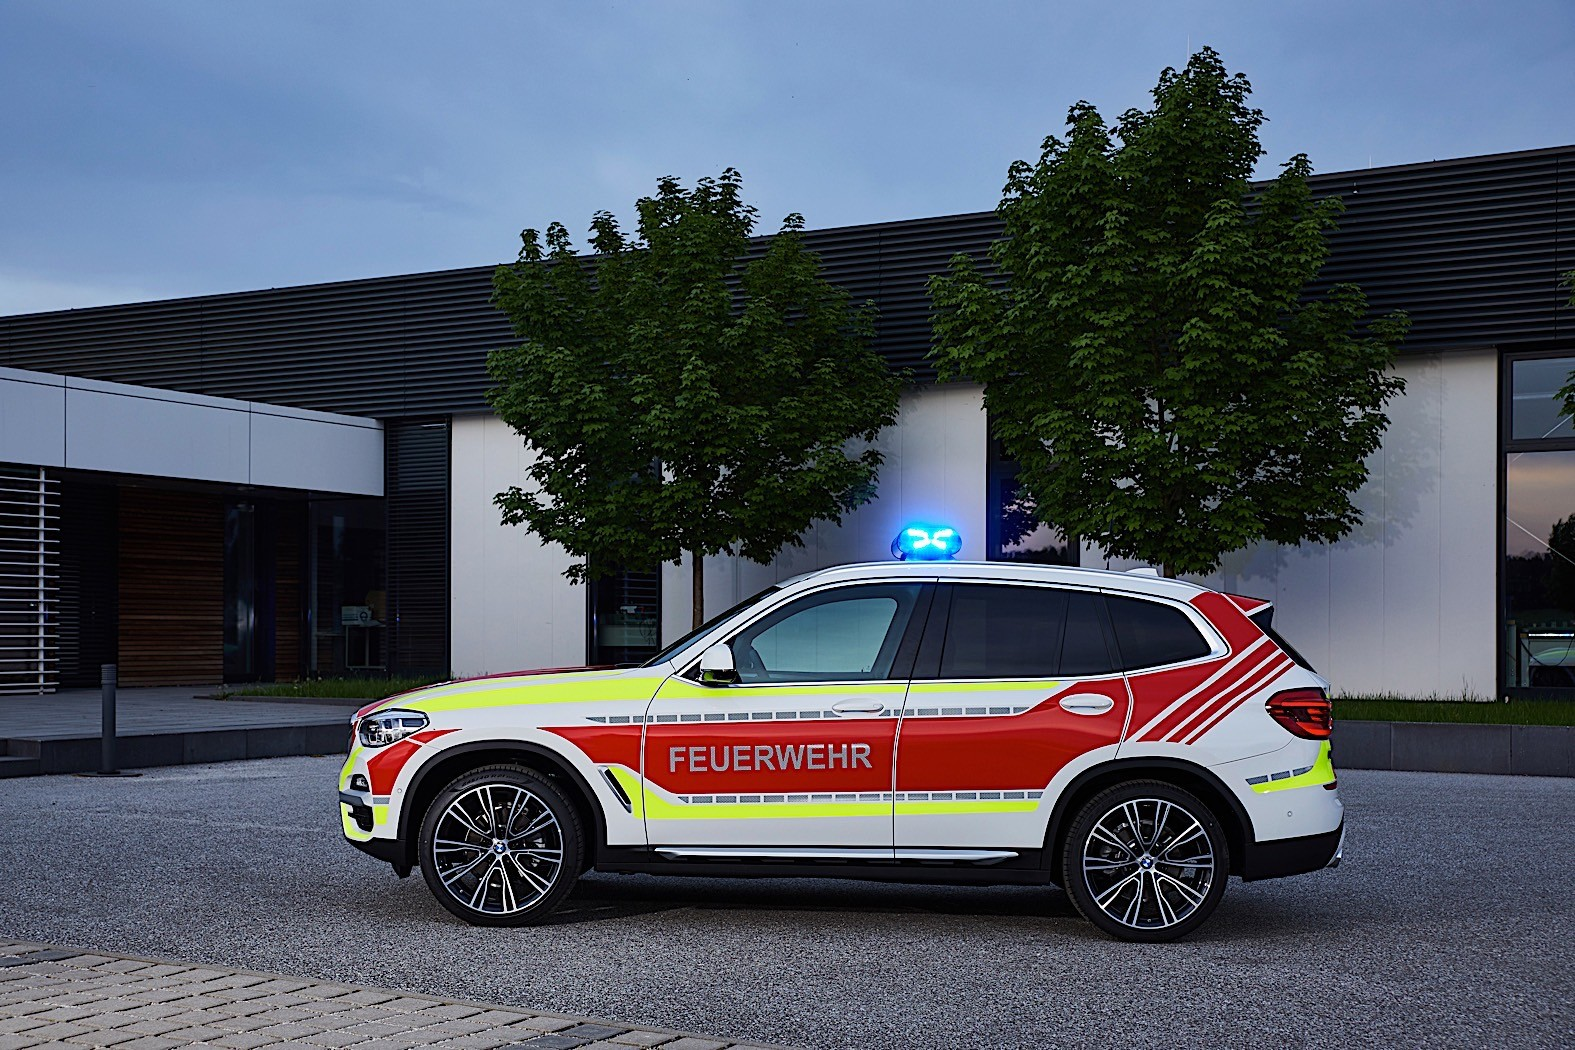 halcore group recalls a number of horton ambulances